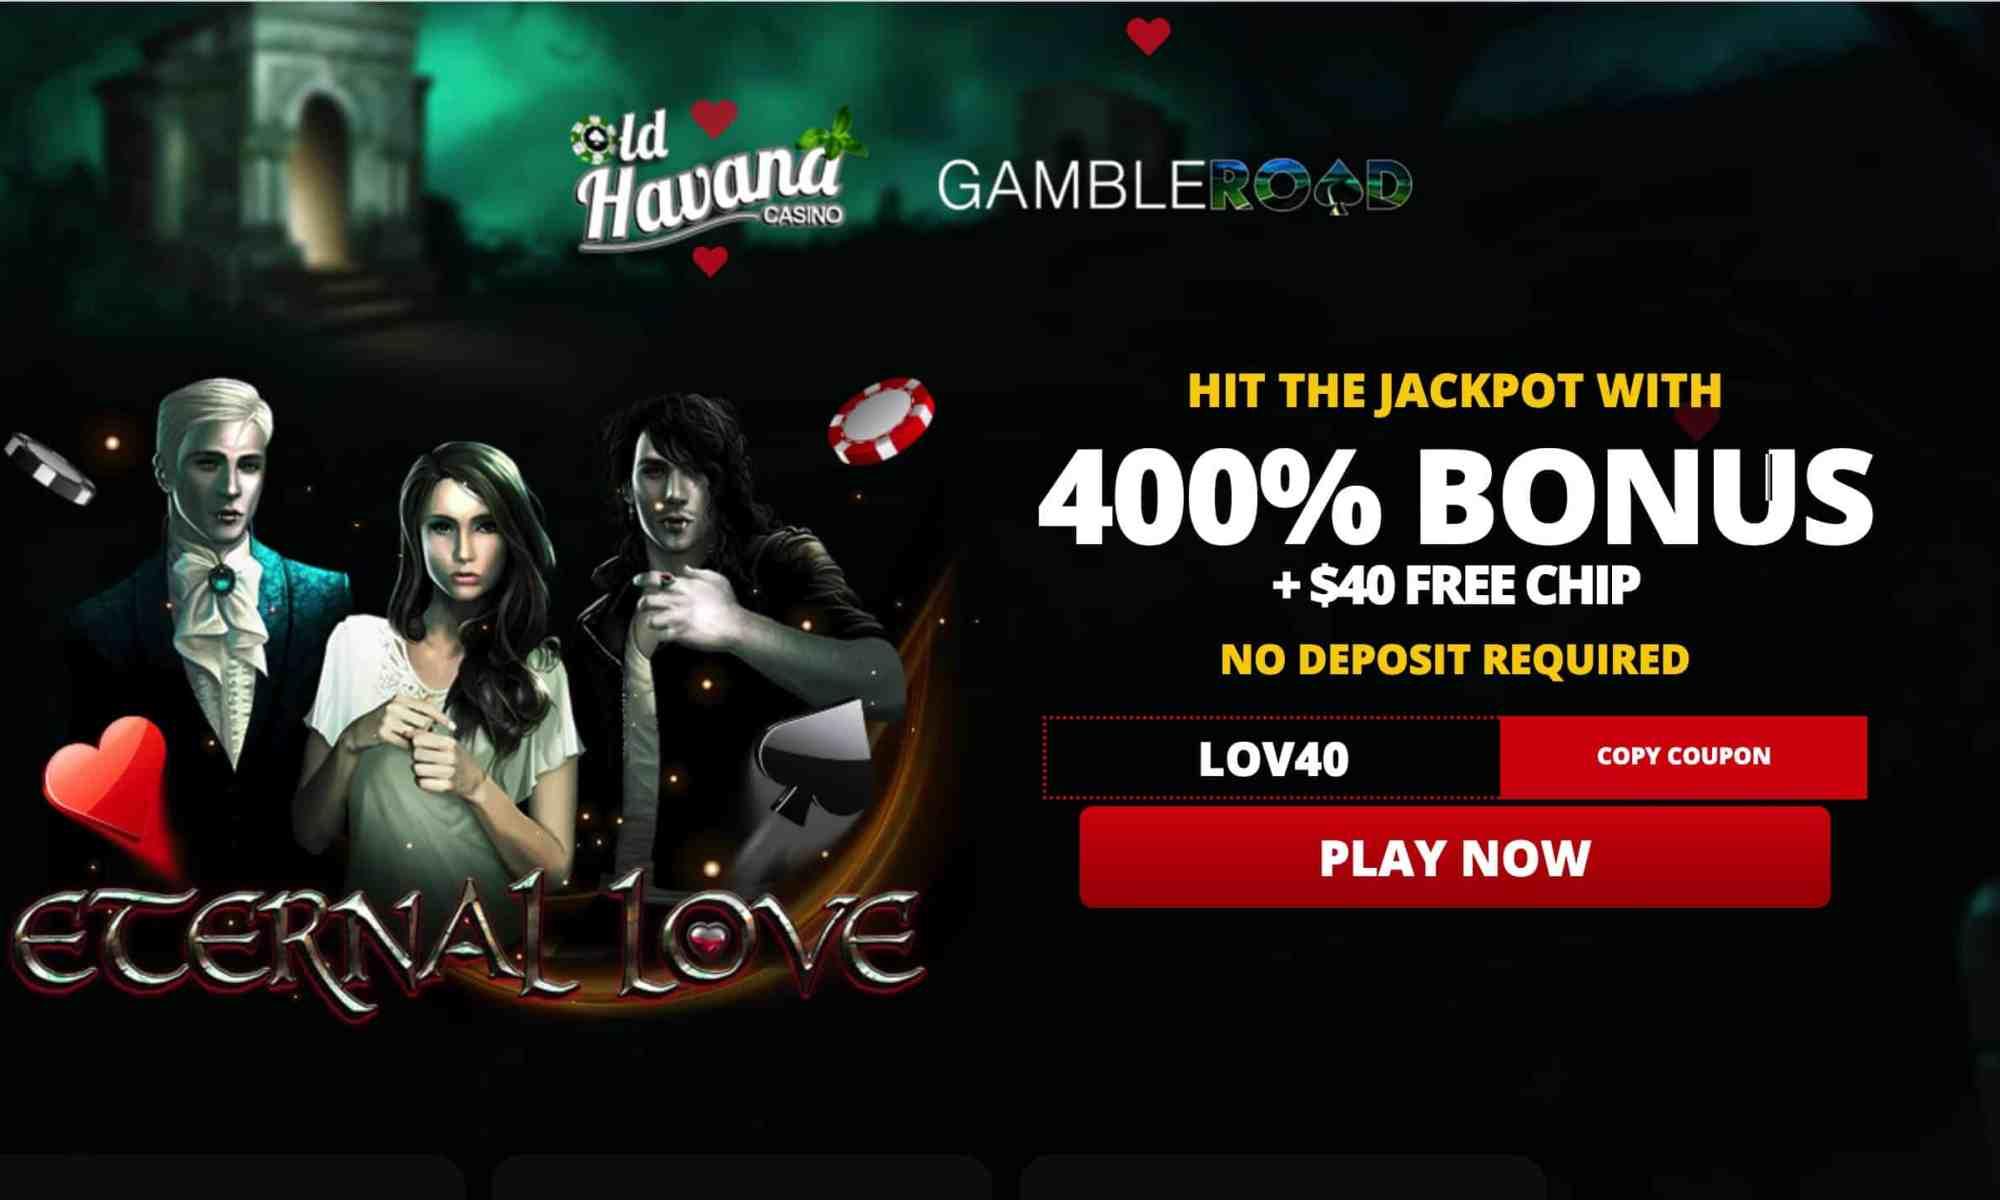 Old Havana Casino - $40 free chips + 400% bonus